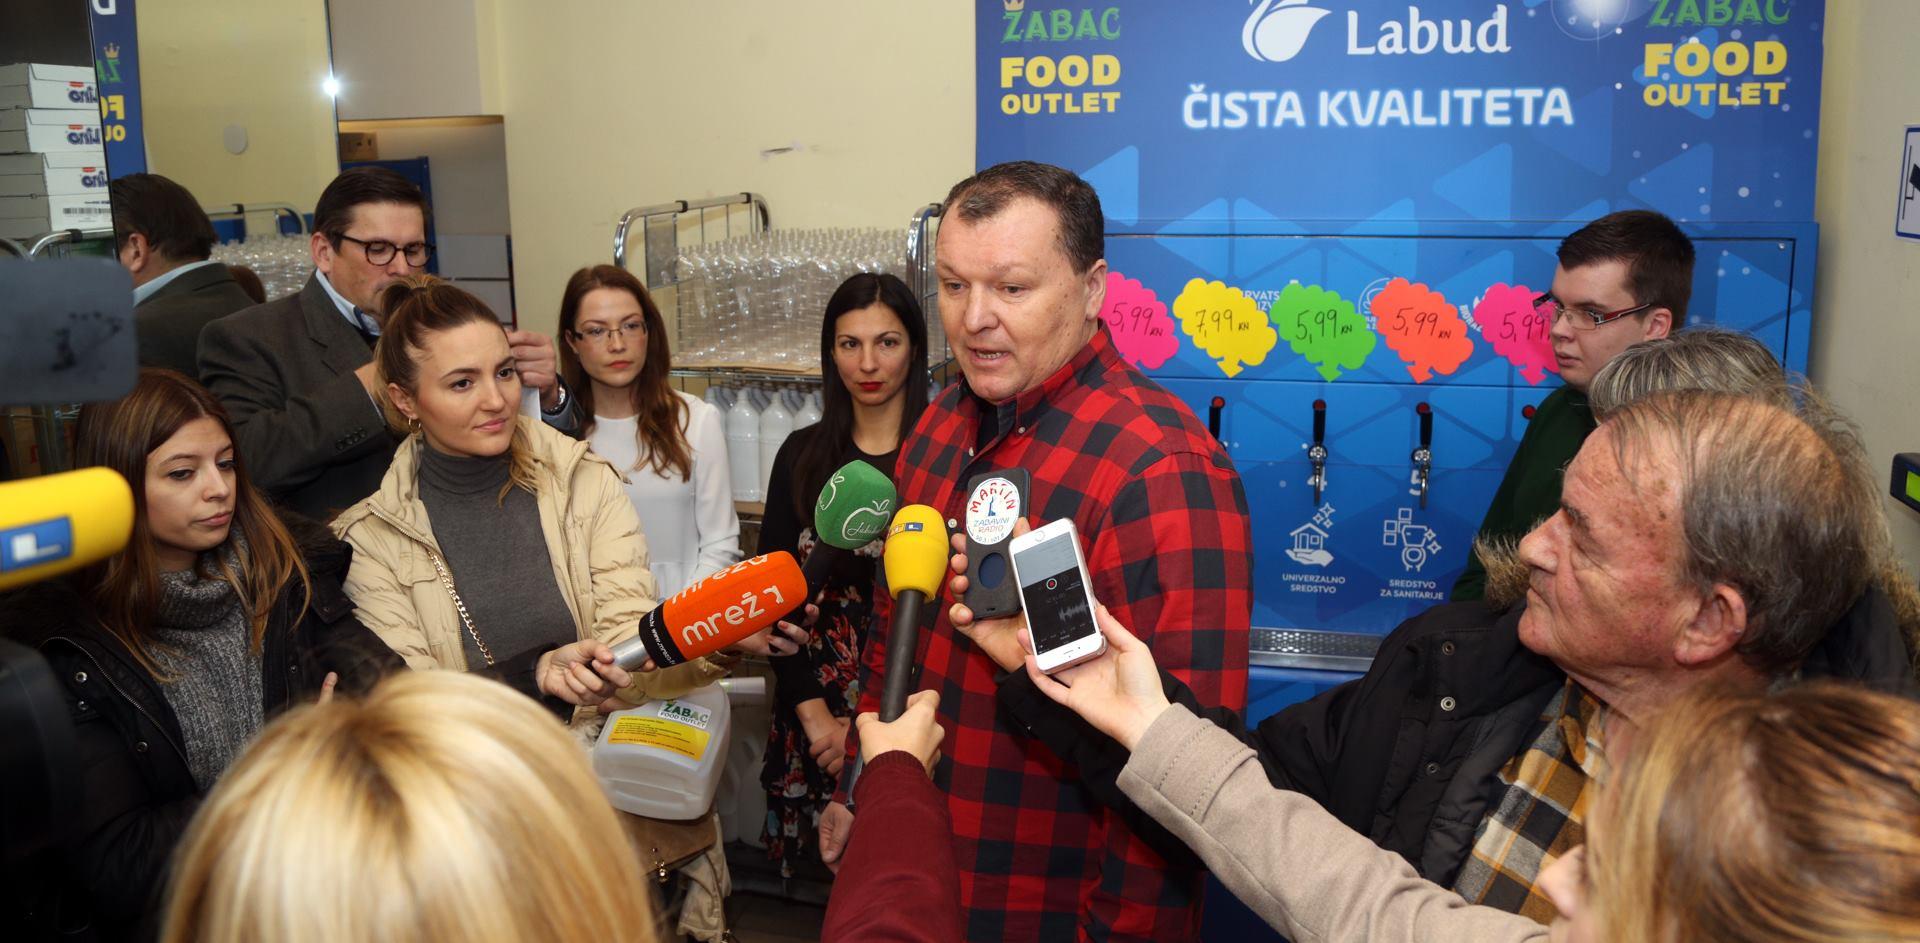 FOTO: FOOD OUTLET ŽABAC Hrvatski aparat s Labud deterdžentima u rinfuzi